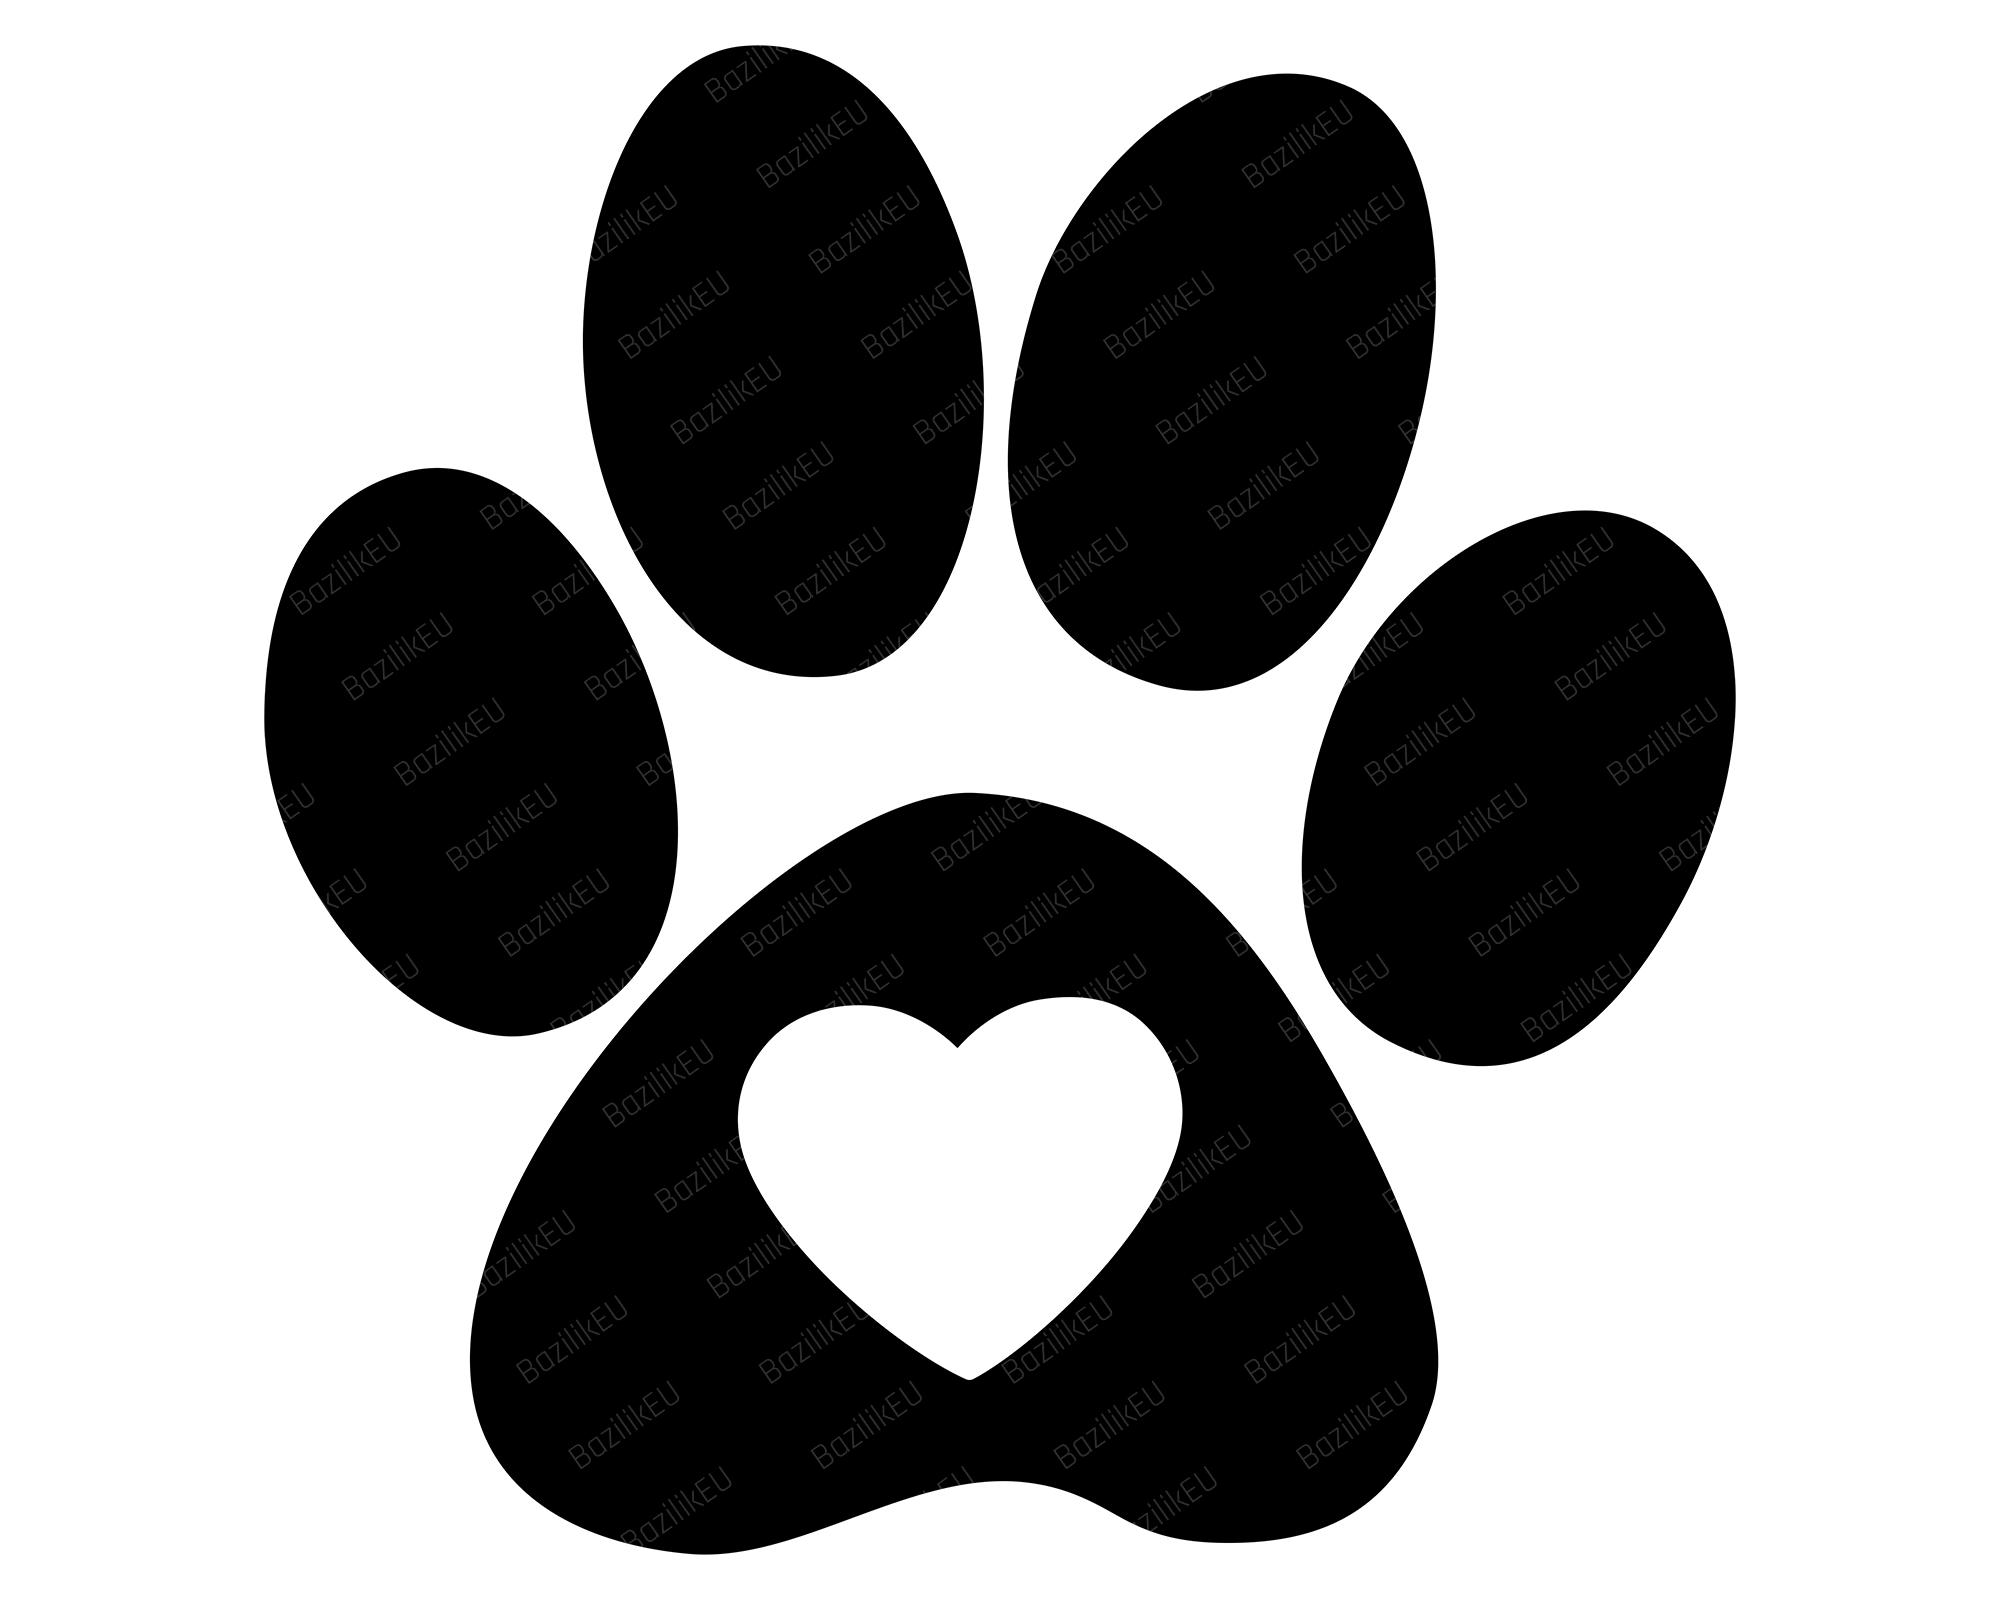 Heart Paw Print Svg Dog Paws Pet Paw Print Svg Dog Love Etsy In 2021 Pet Paw Print Cat Paw Print Paw Illustration